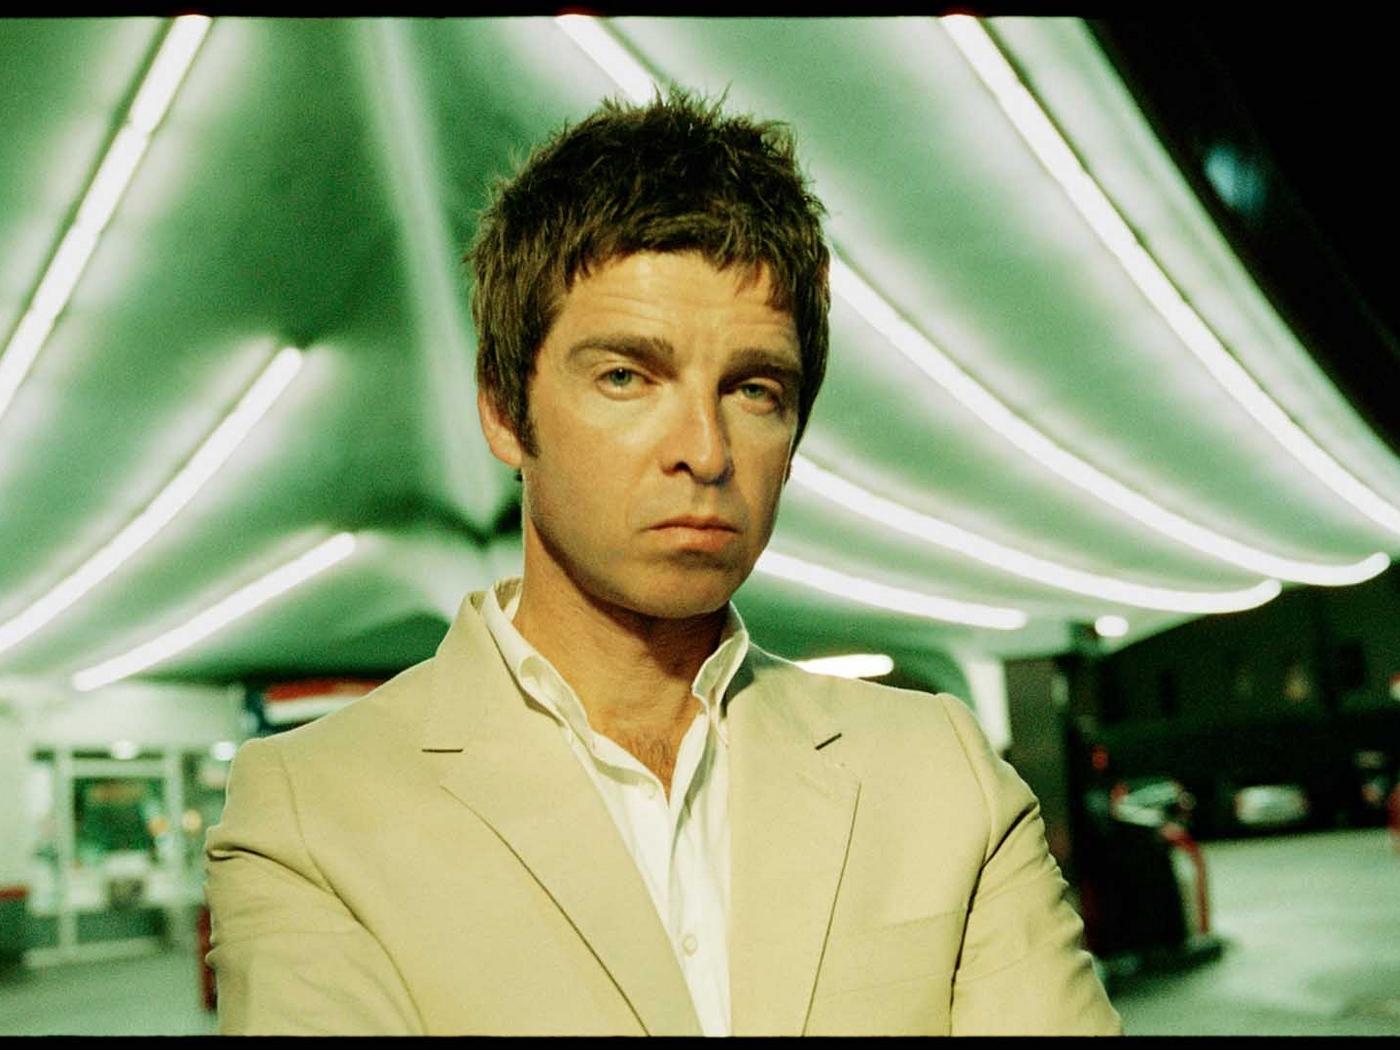 Wallpaper Noel Gallagher, Suit, Shirt, Filling, Night - Noel Gallagher , HD Wallpaper & Backgrounds